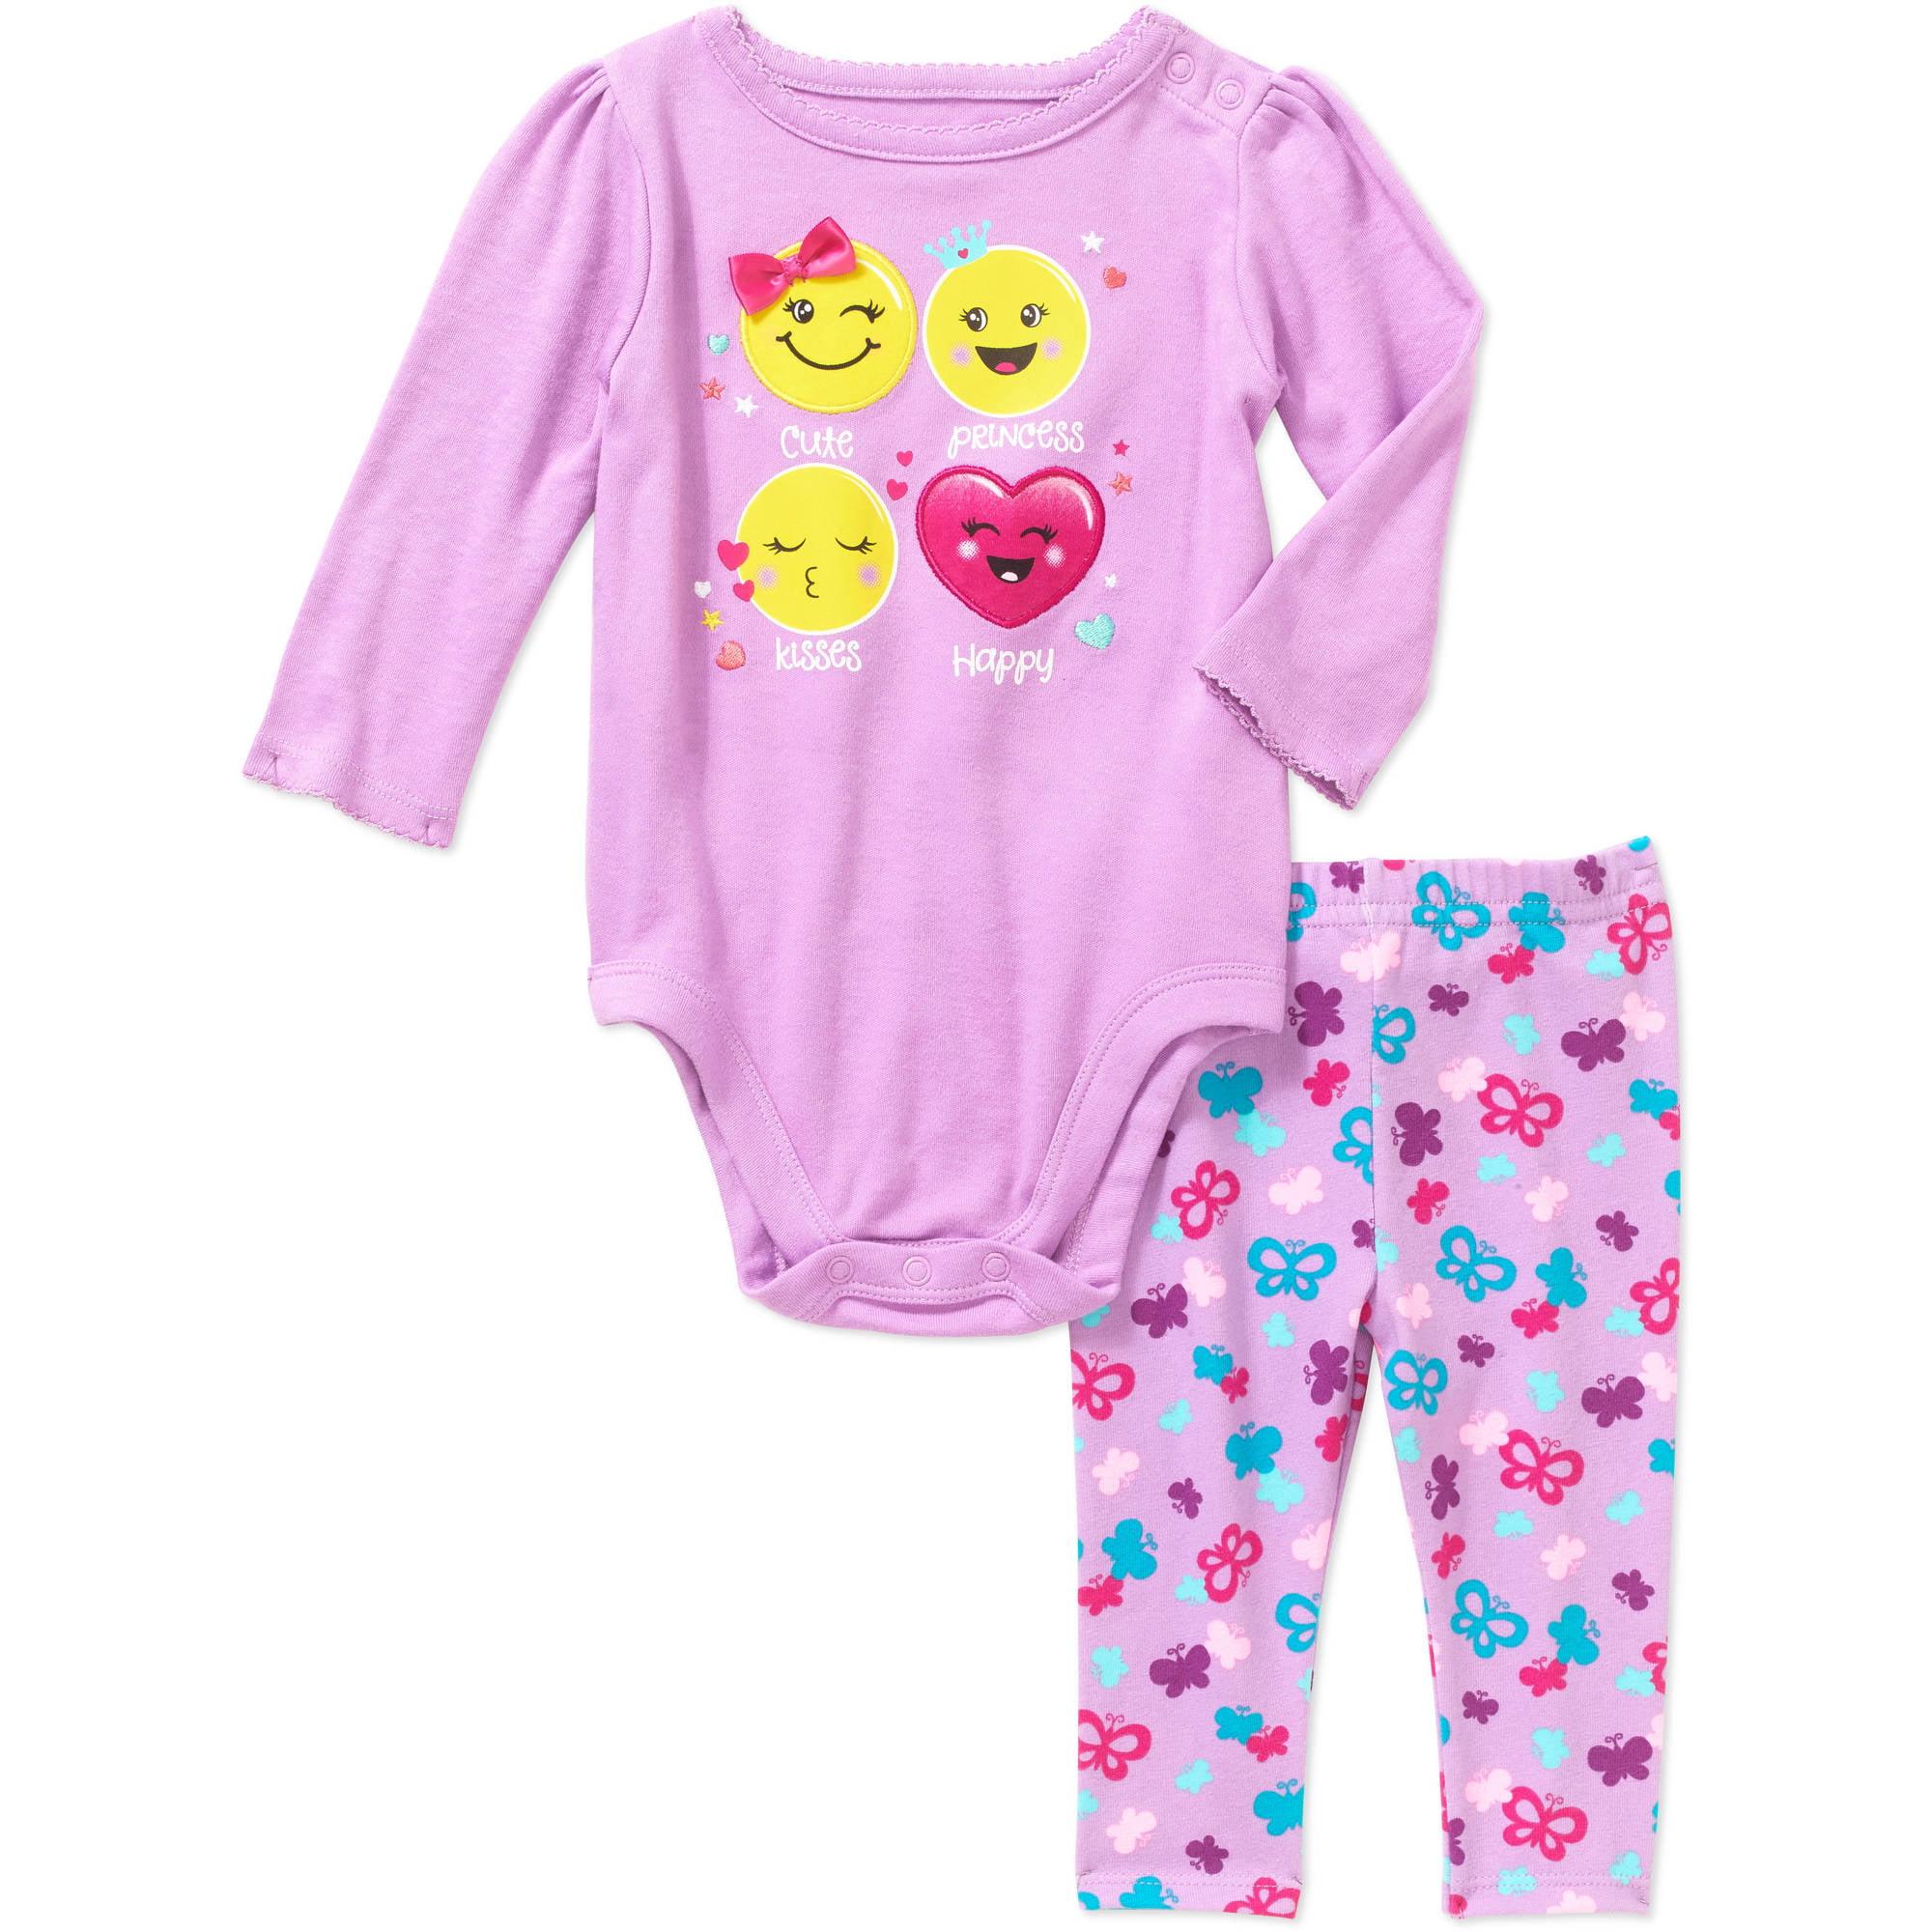 Garanimals Newborn Baby Girls' Graphic Bodysuit and Printed Leggings 2-Piece Outfit Set